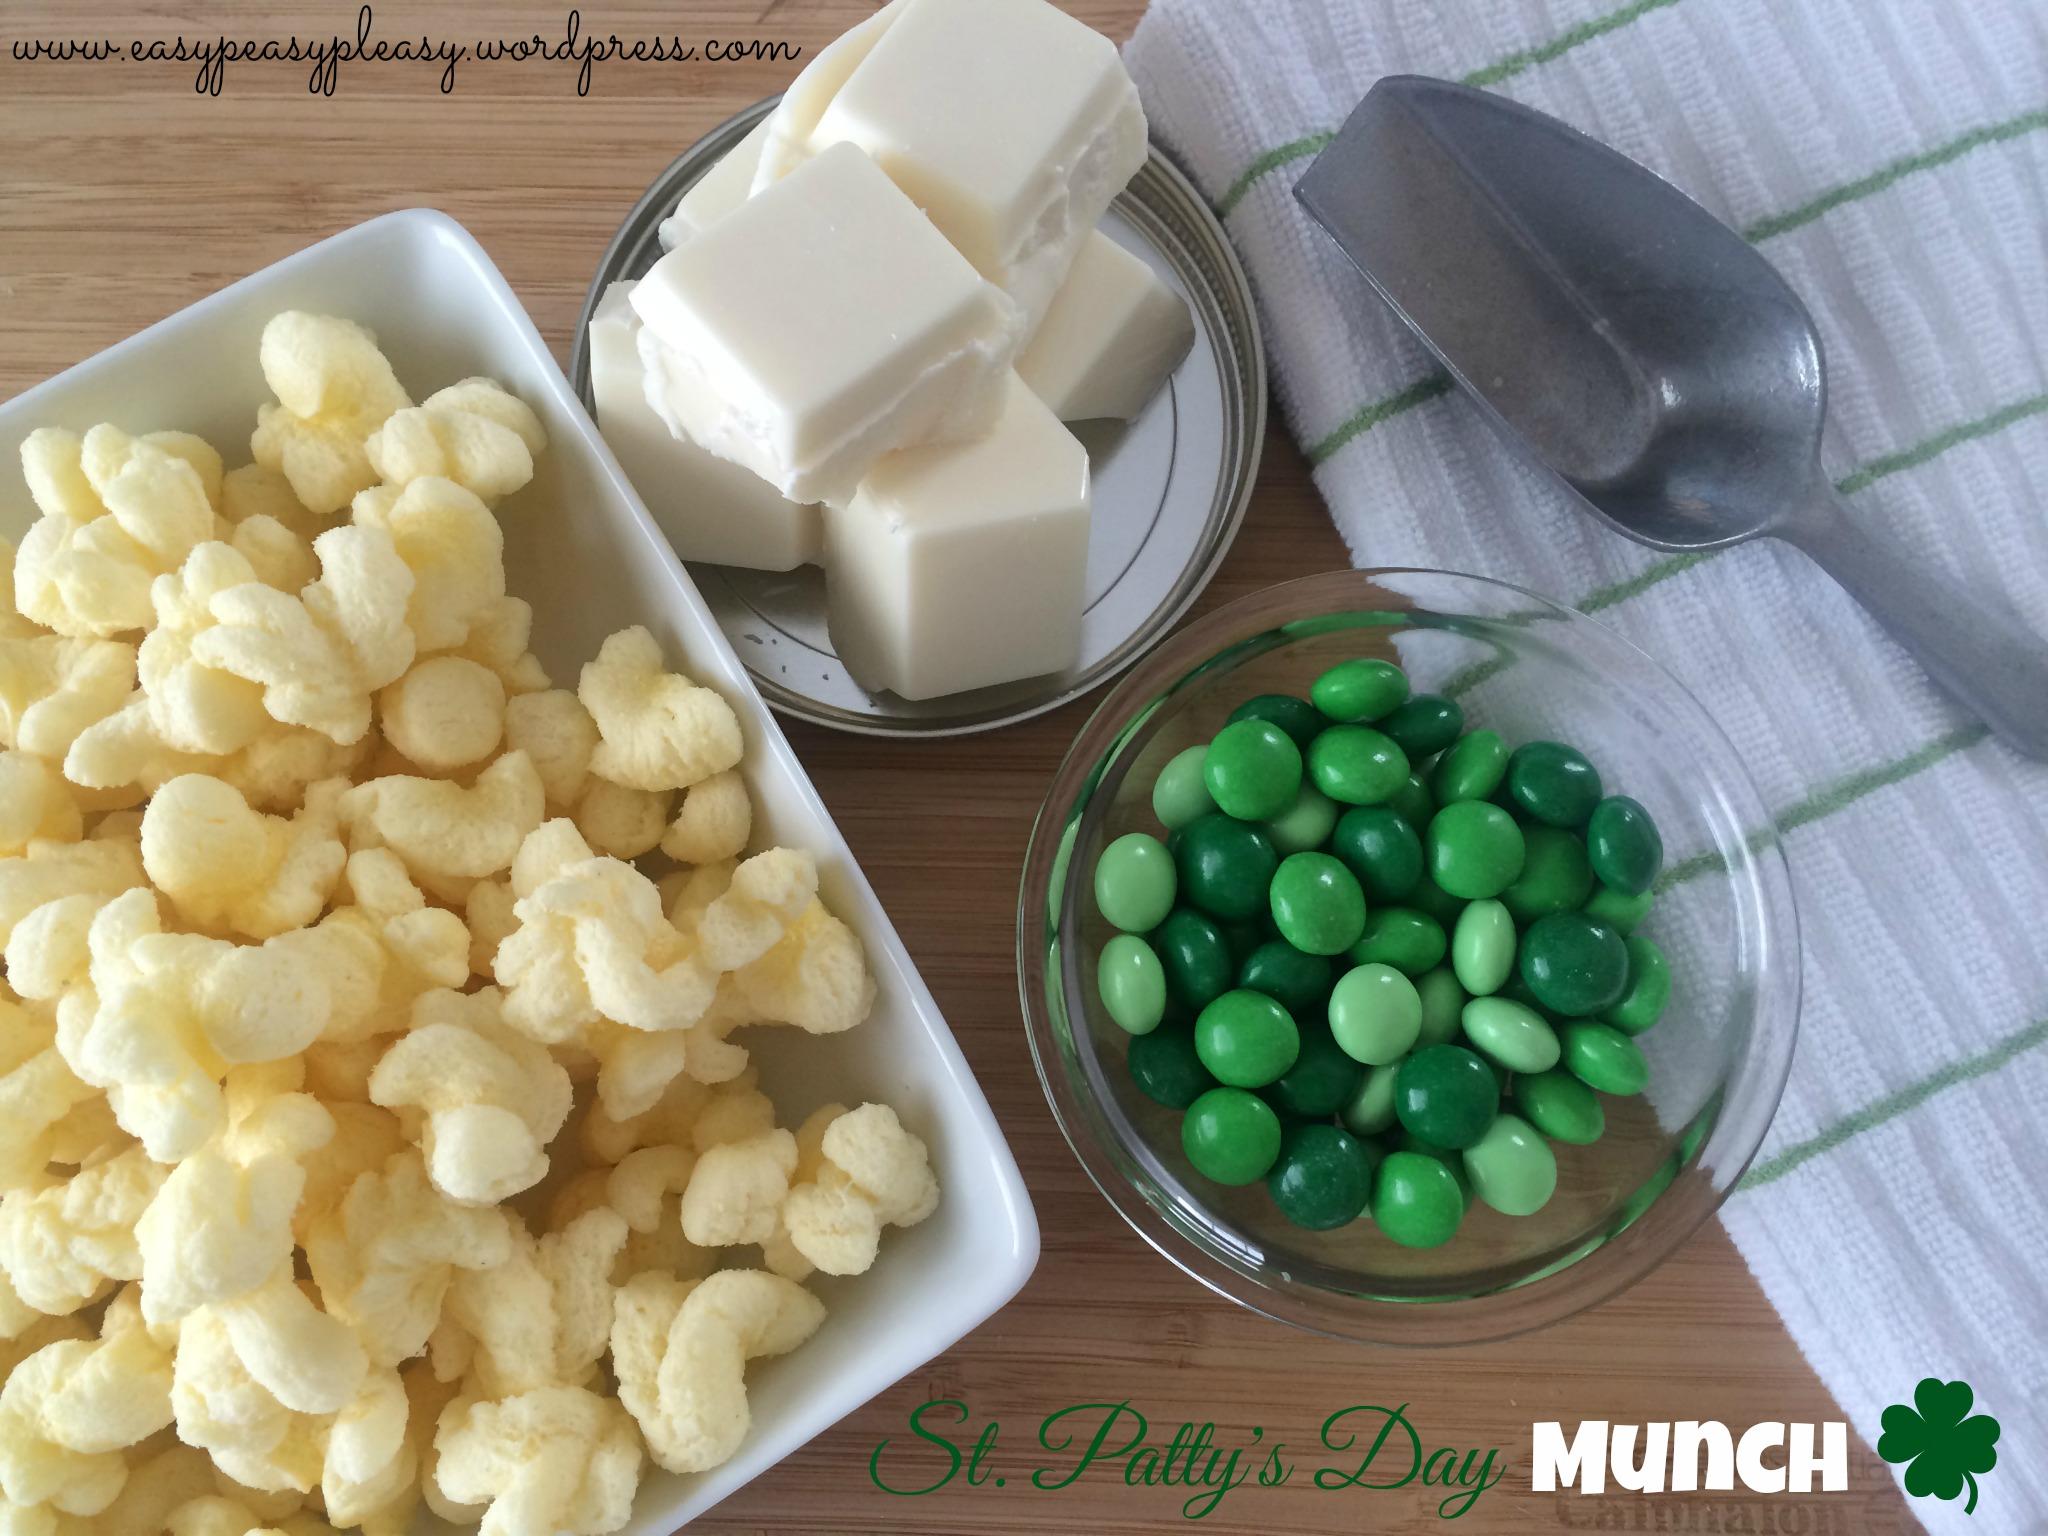 Easy St. Patrick's Day snack Idea at https://easypeasypleasy.com